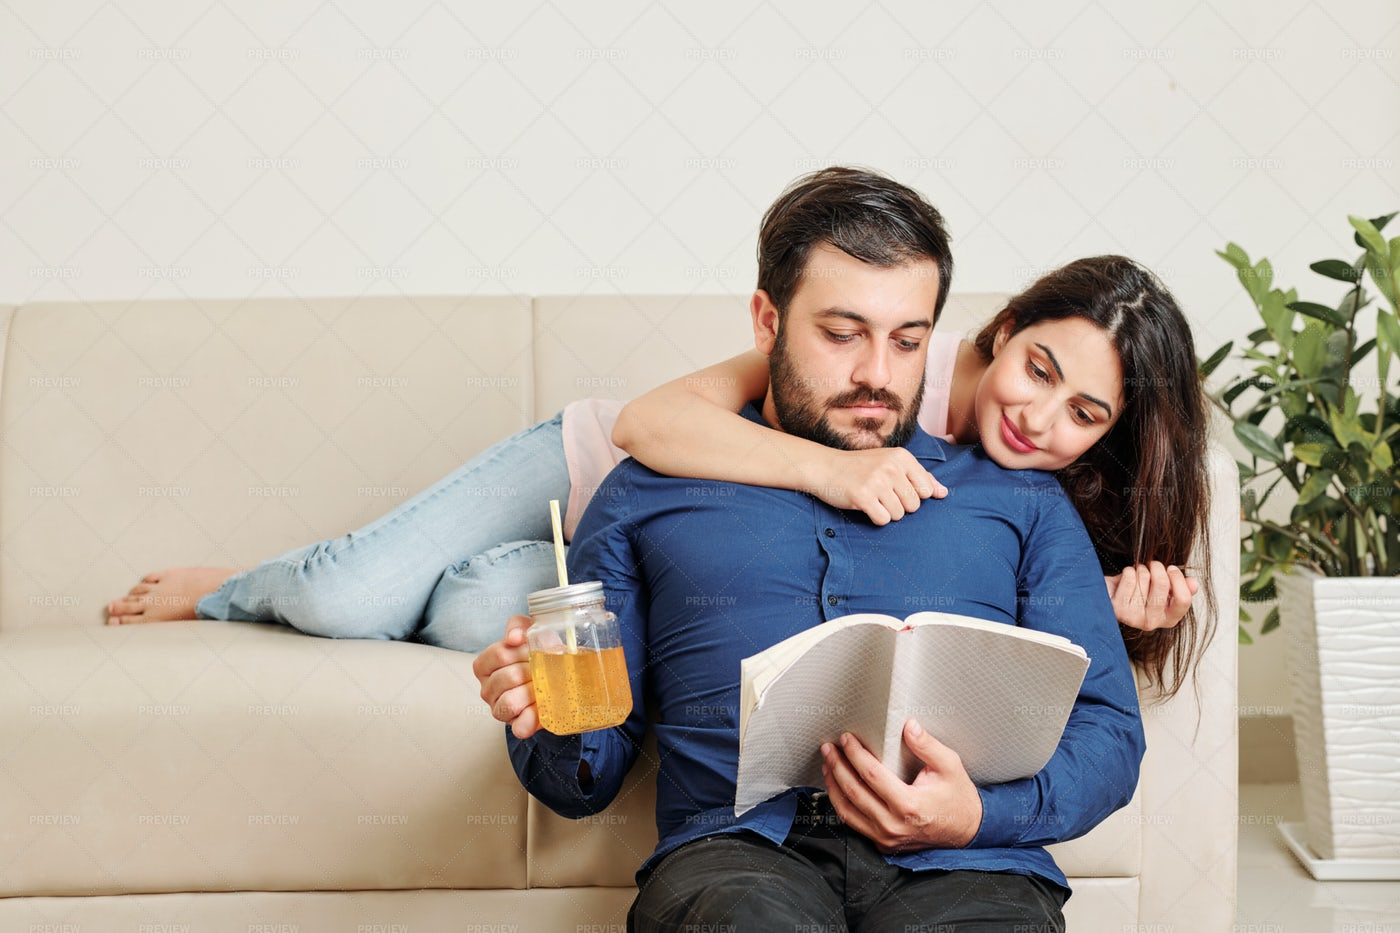 Woman Reading With Boyfriend: Stock Photos